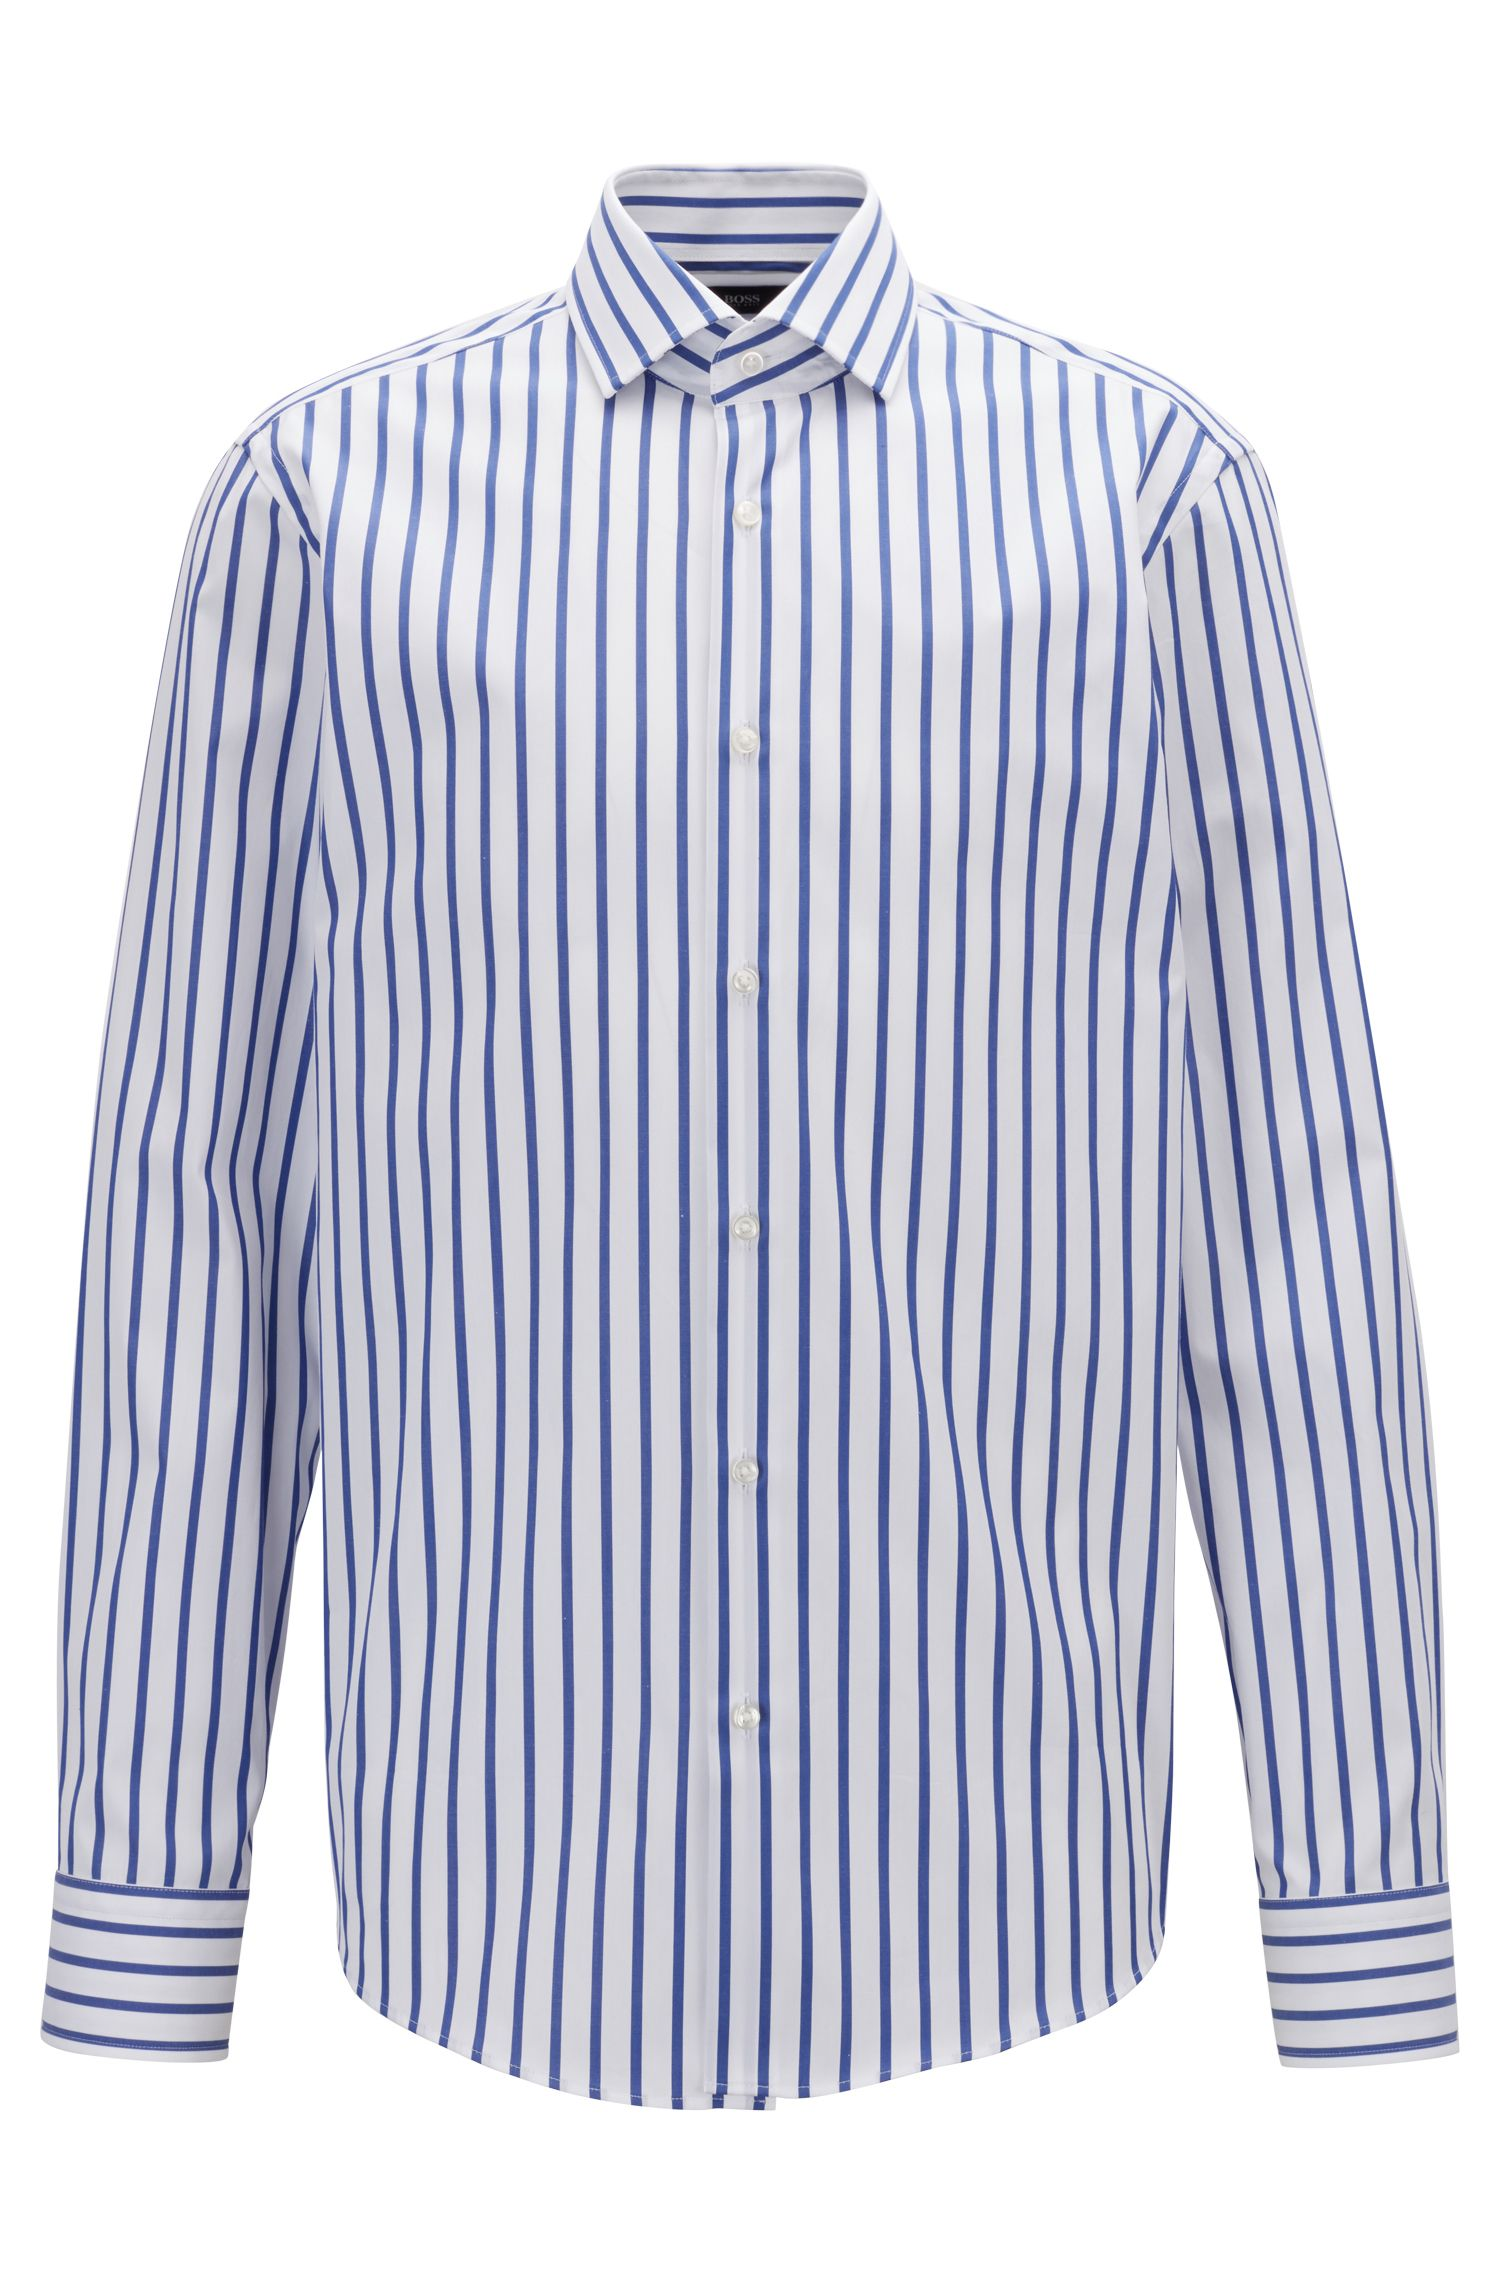 Striped regular-fit shirt in cotton poplin, Blue